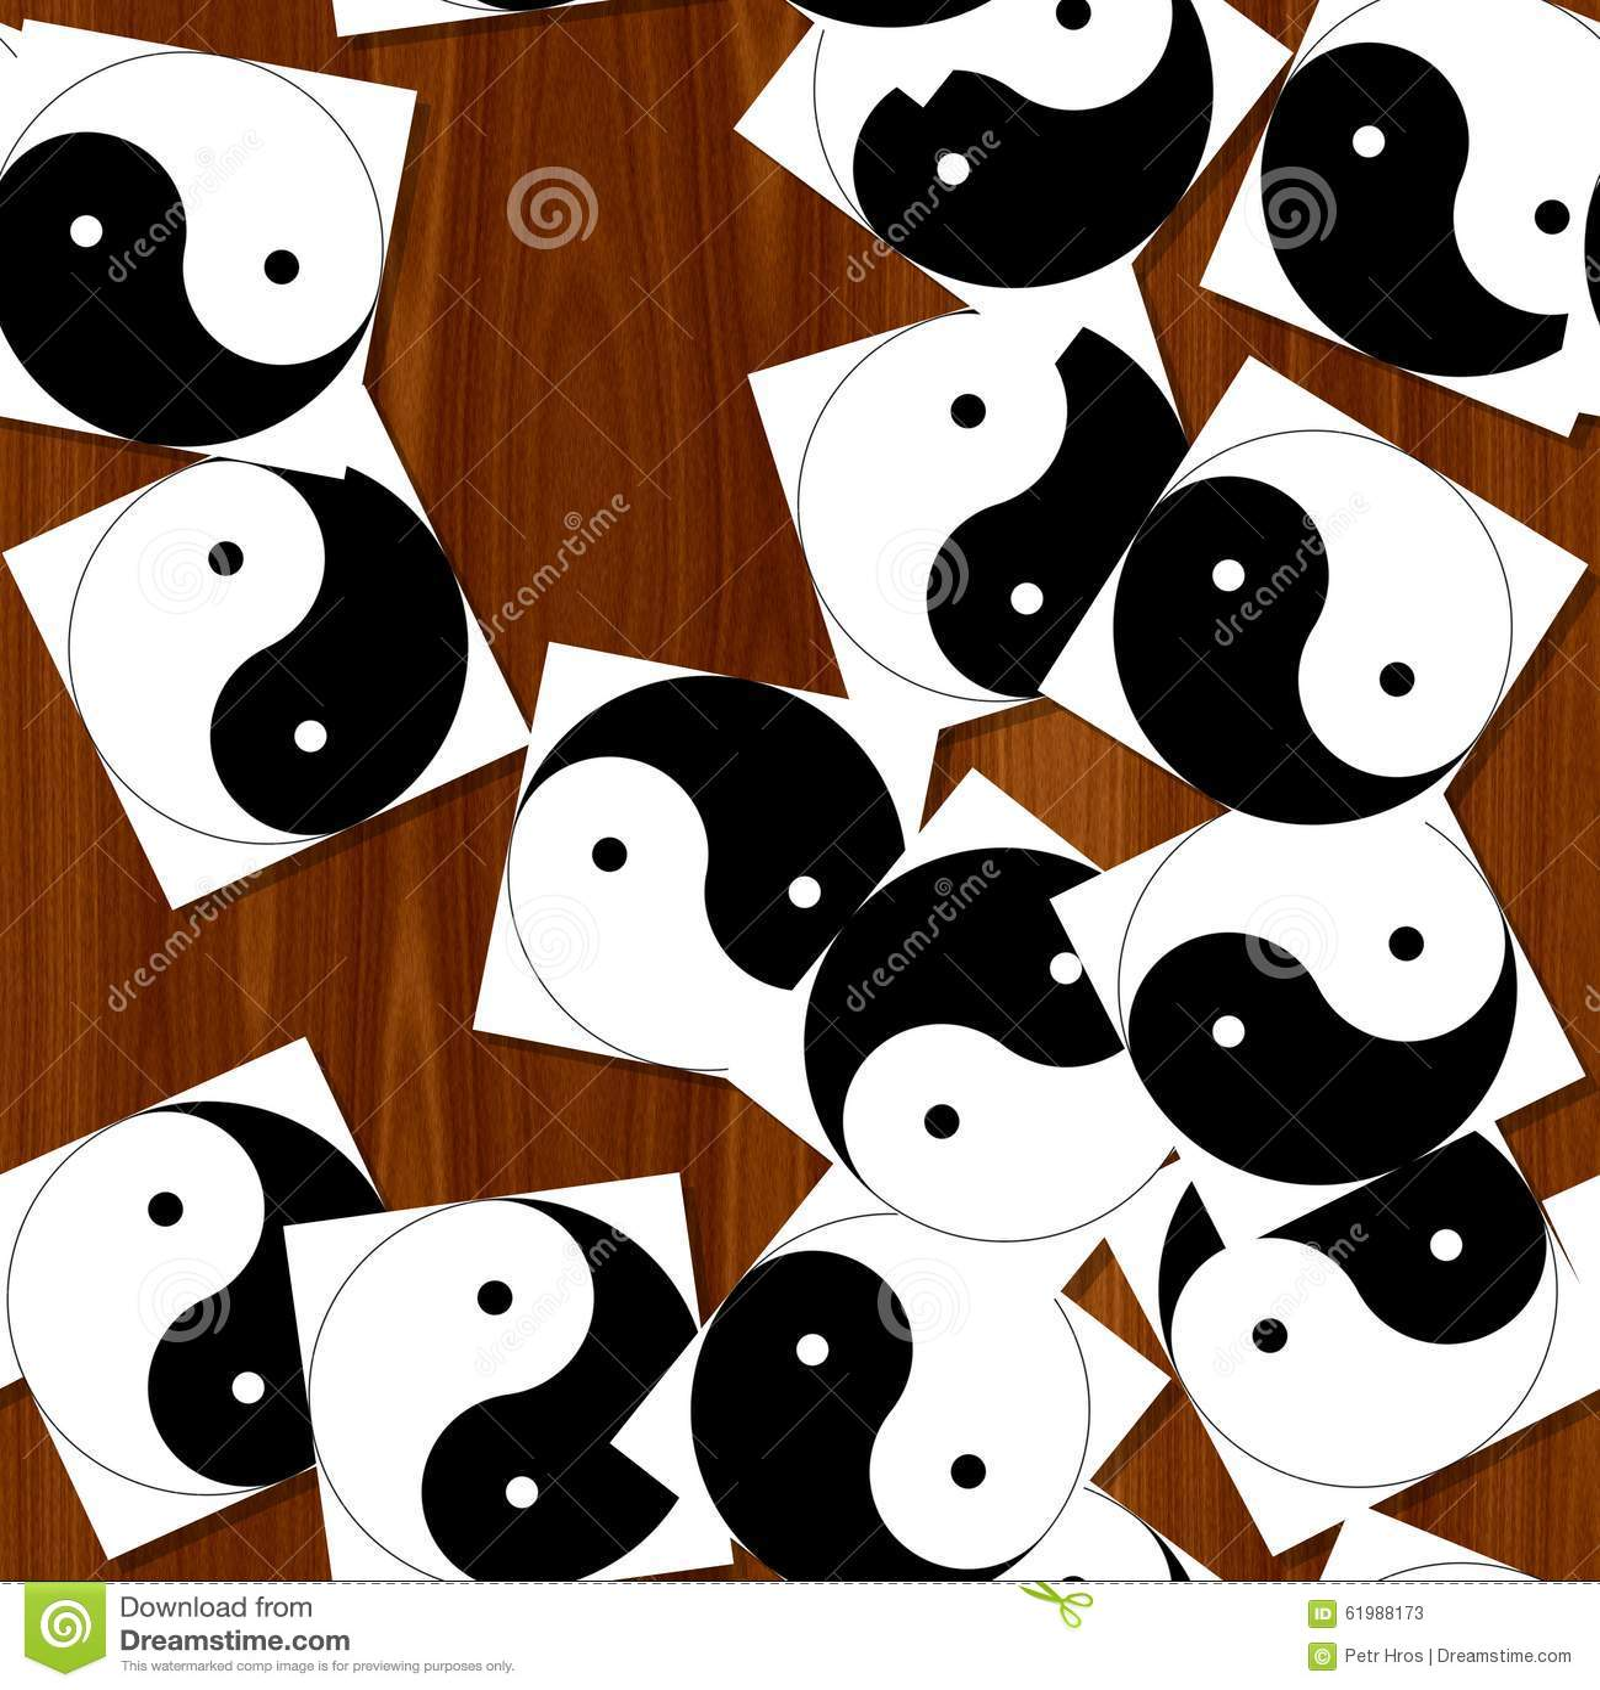 Jin jang stock illustration image 61988173 for Table yin yang basse